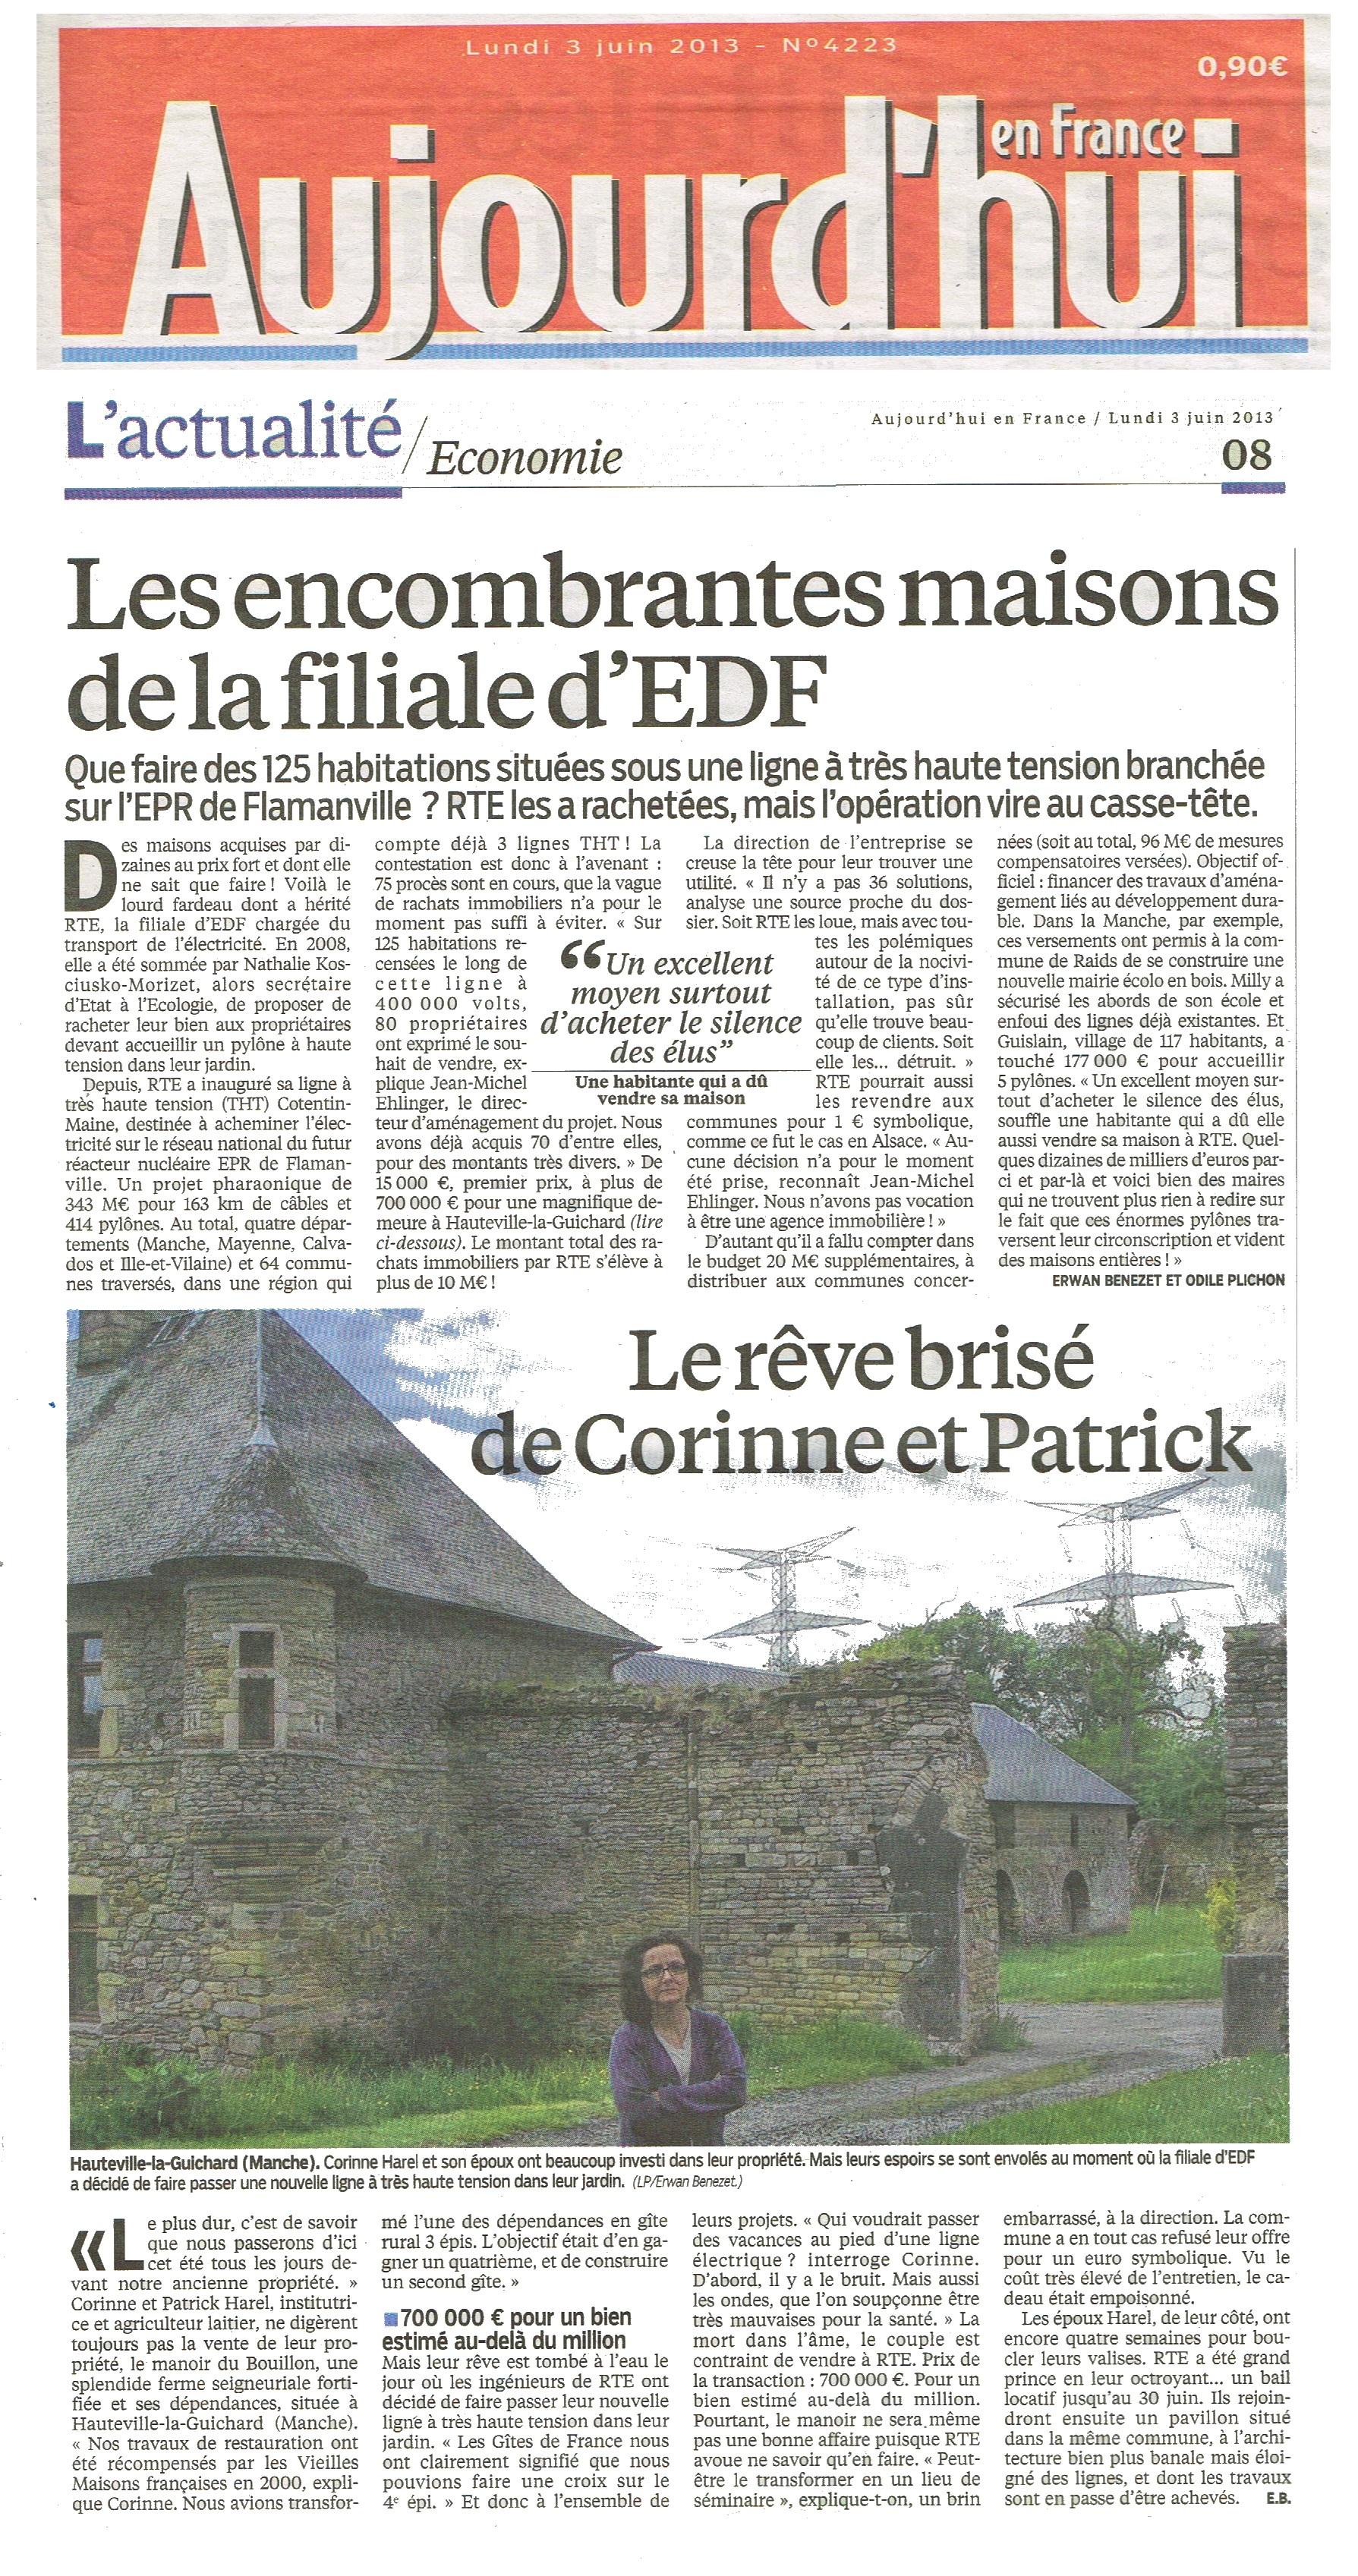 Aujourd'hui en France du 08 juin 2013